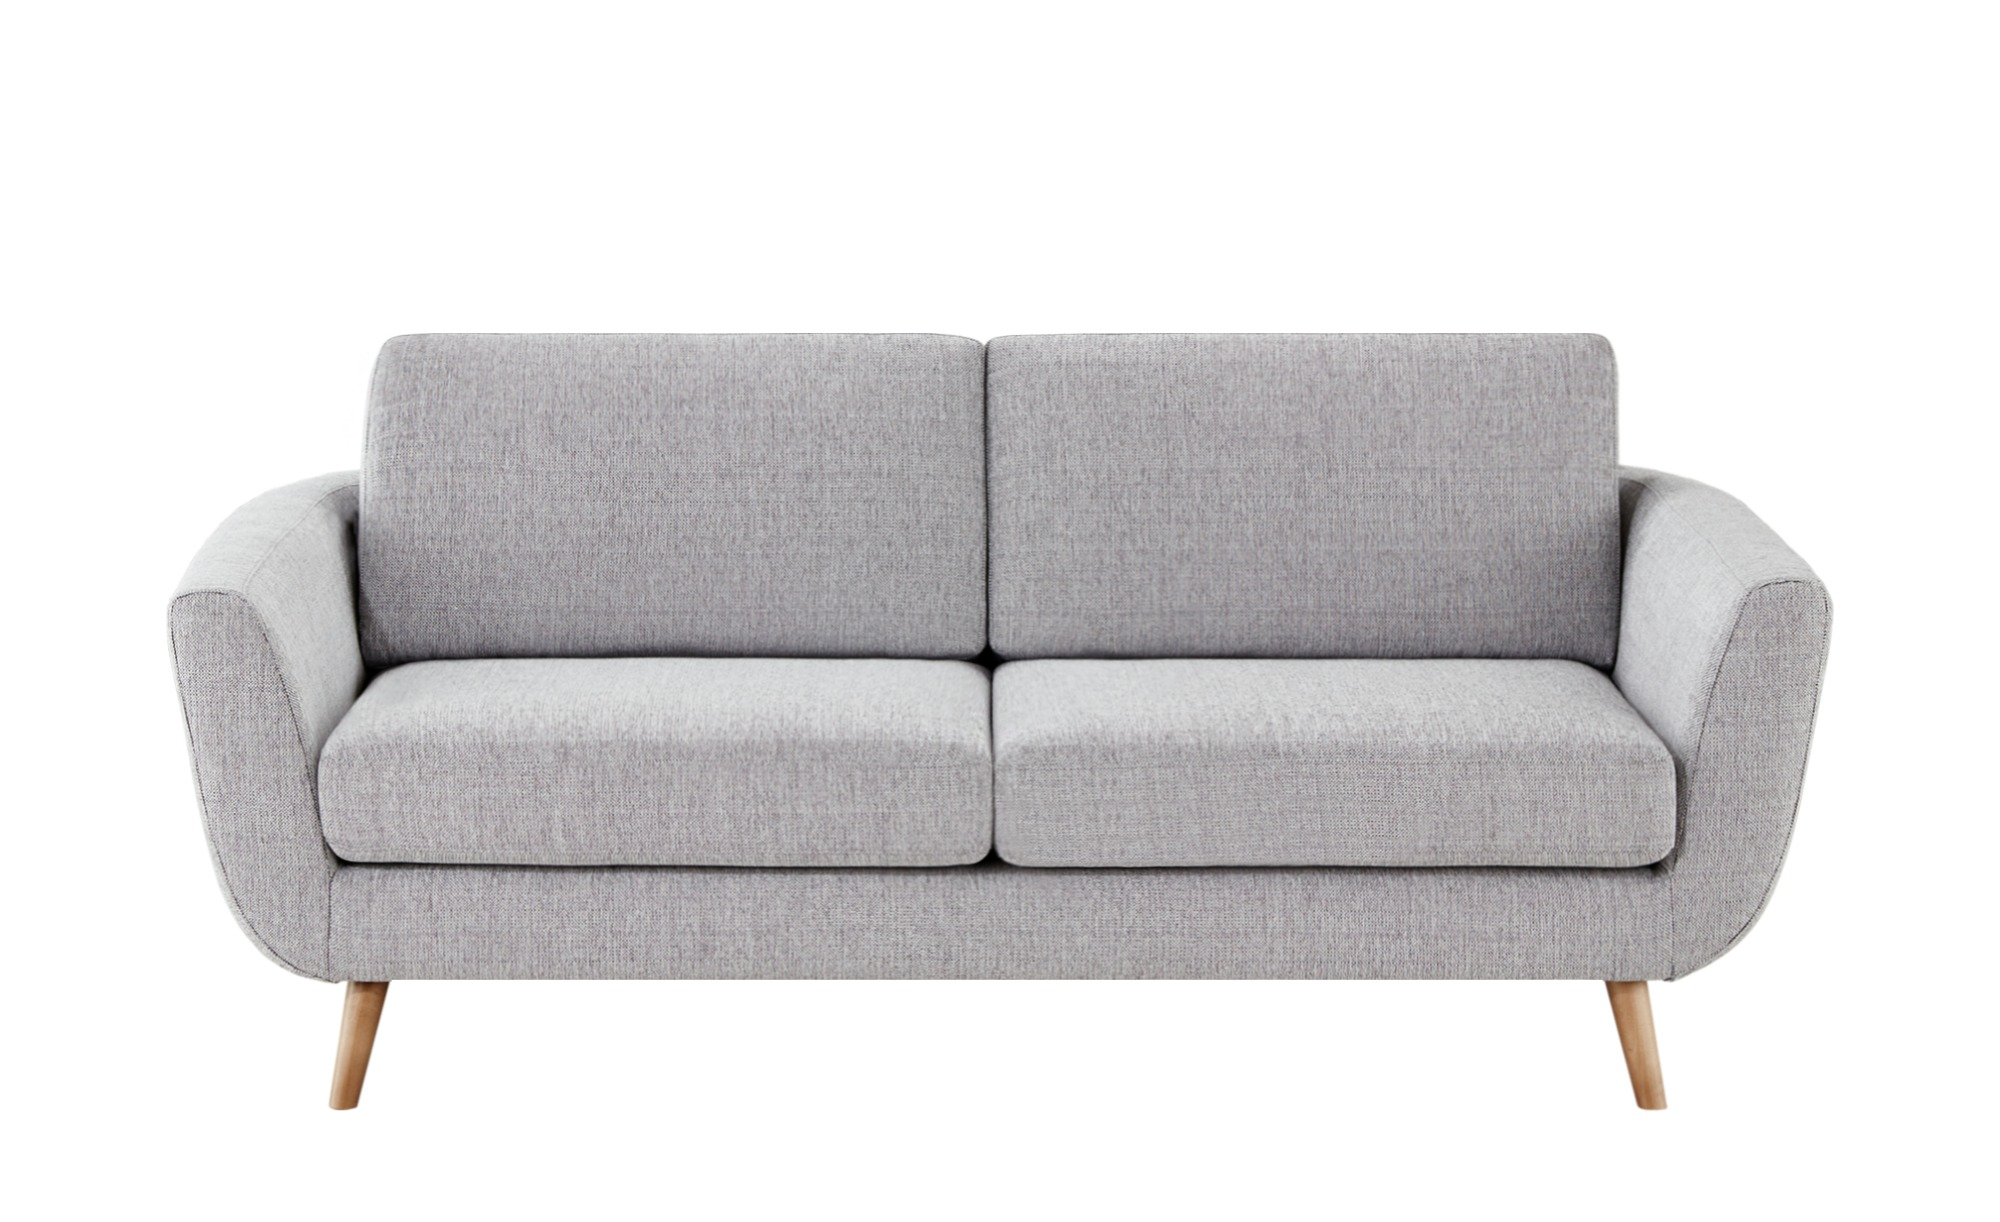 Full Size of Sofa 2 5 Sitzer Mit Relaxfunktion Leder Elektrisch Landhausstil Federkern Schlaffunktion Couch Microfaser Grau Marilyn Stoff Soho Webstoff Smilla 3 1 Bunt Bett Sofa Sofa 2 5 Sitzer